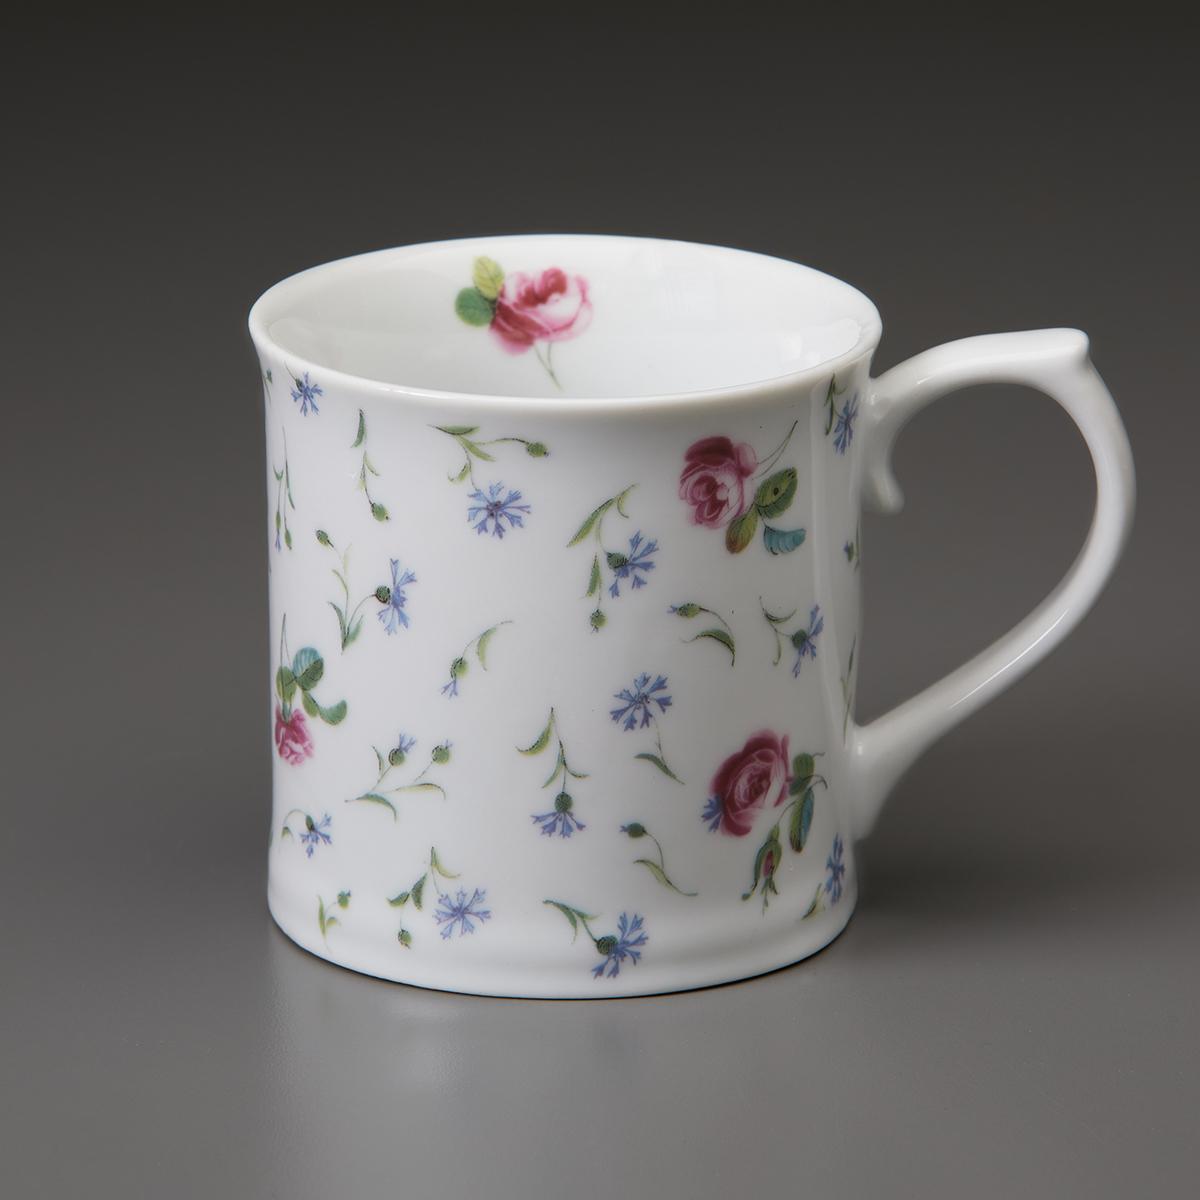 White porcelain mug with flowers